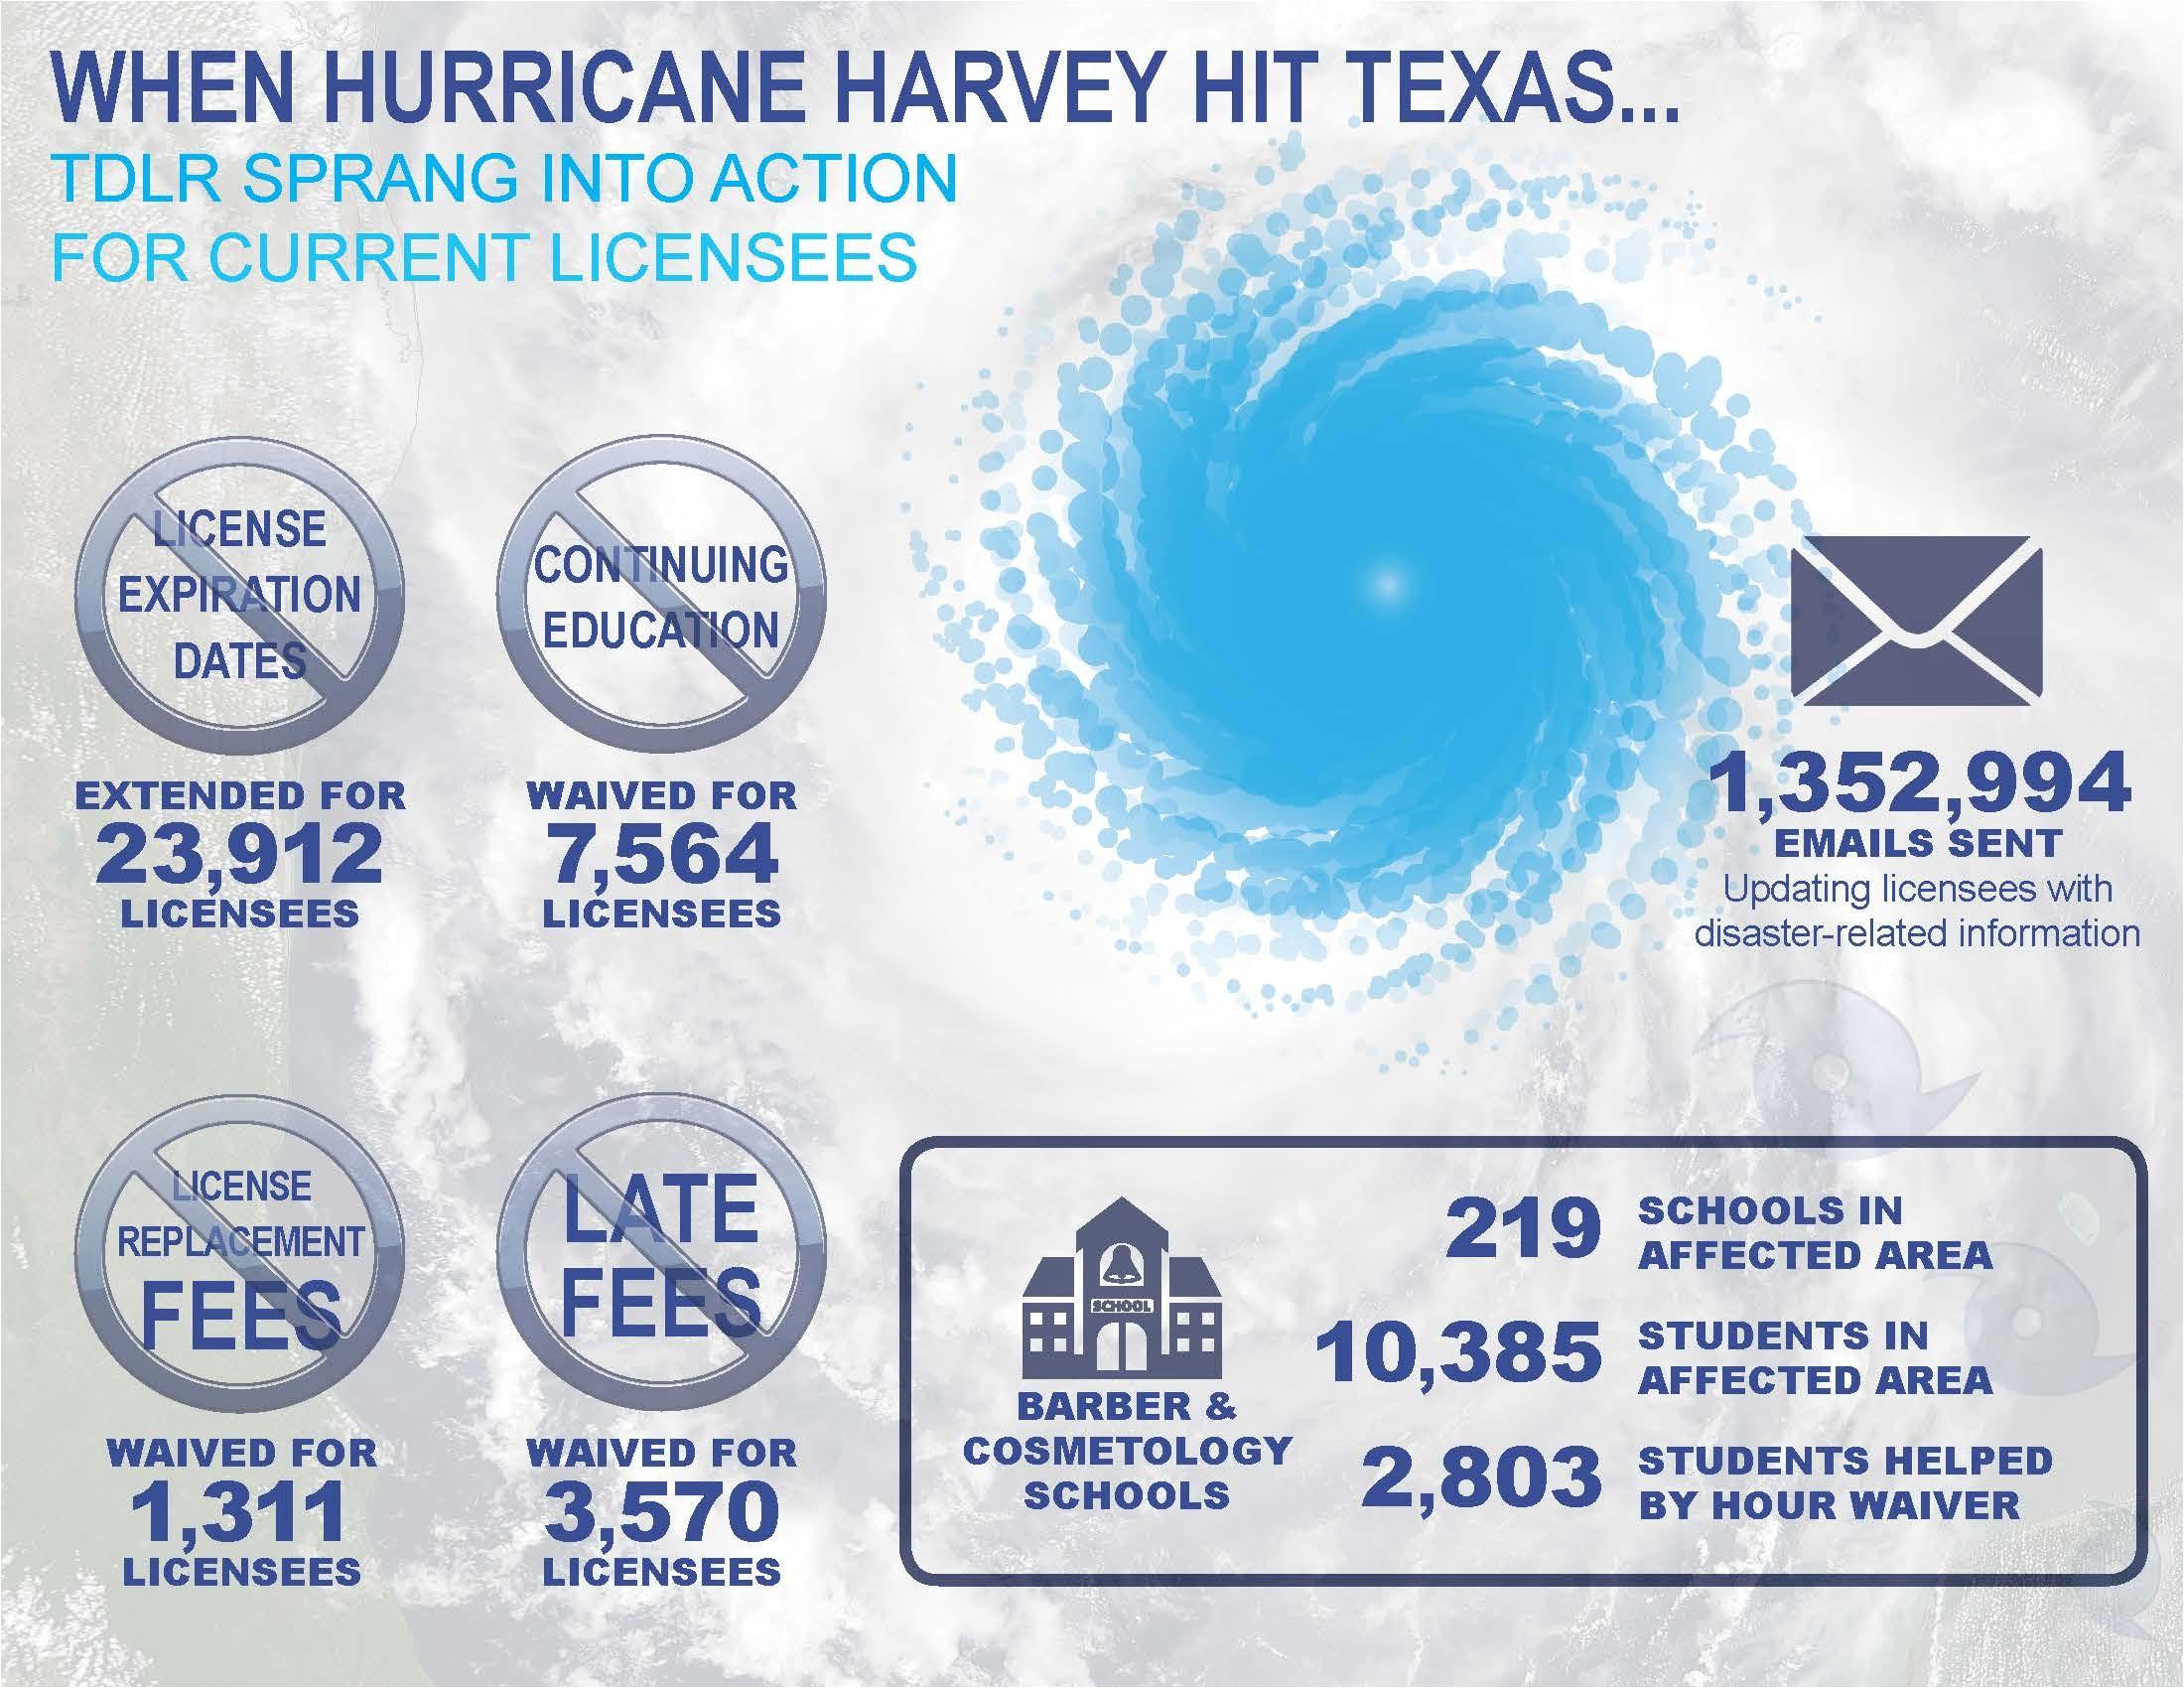 hurricane harvey tdlr response infographic 2